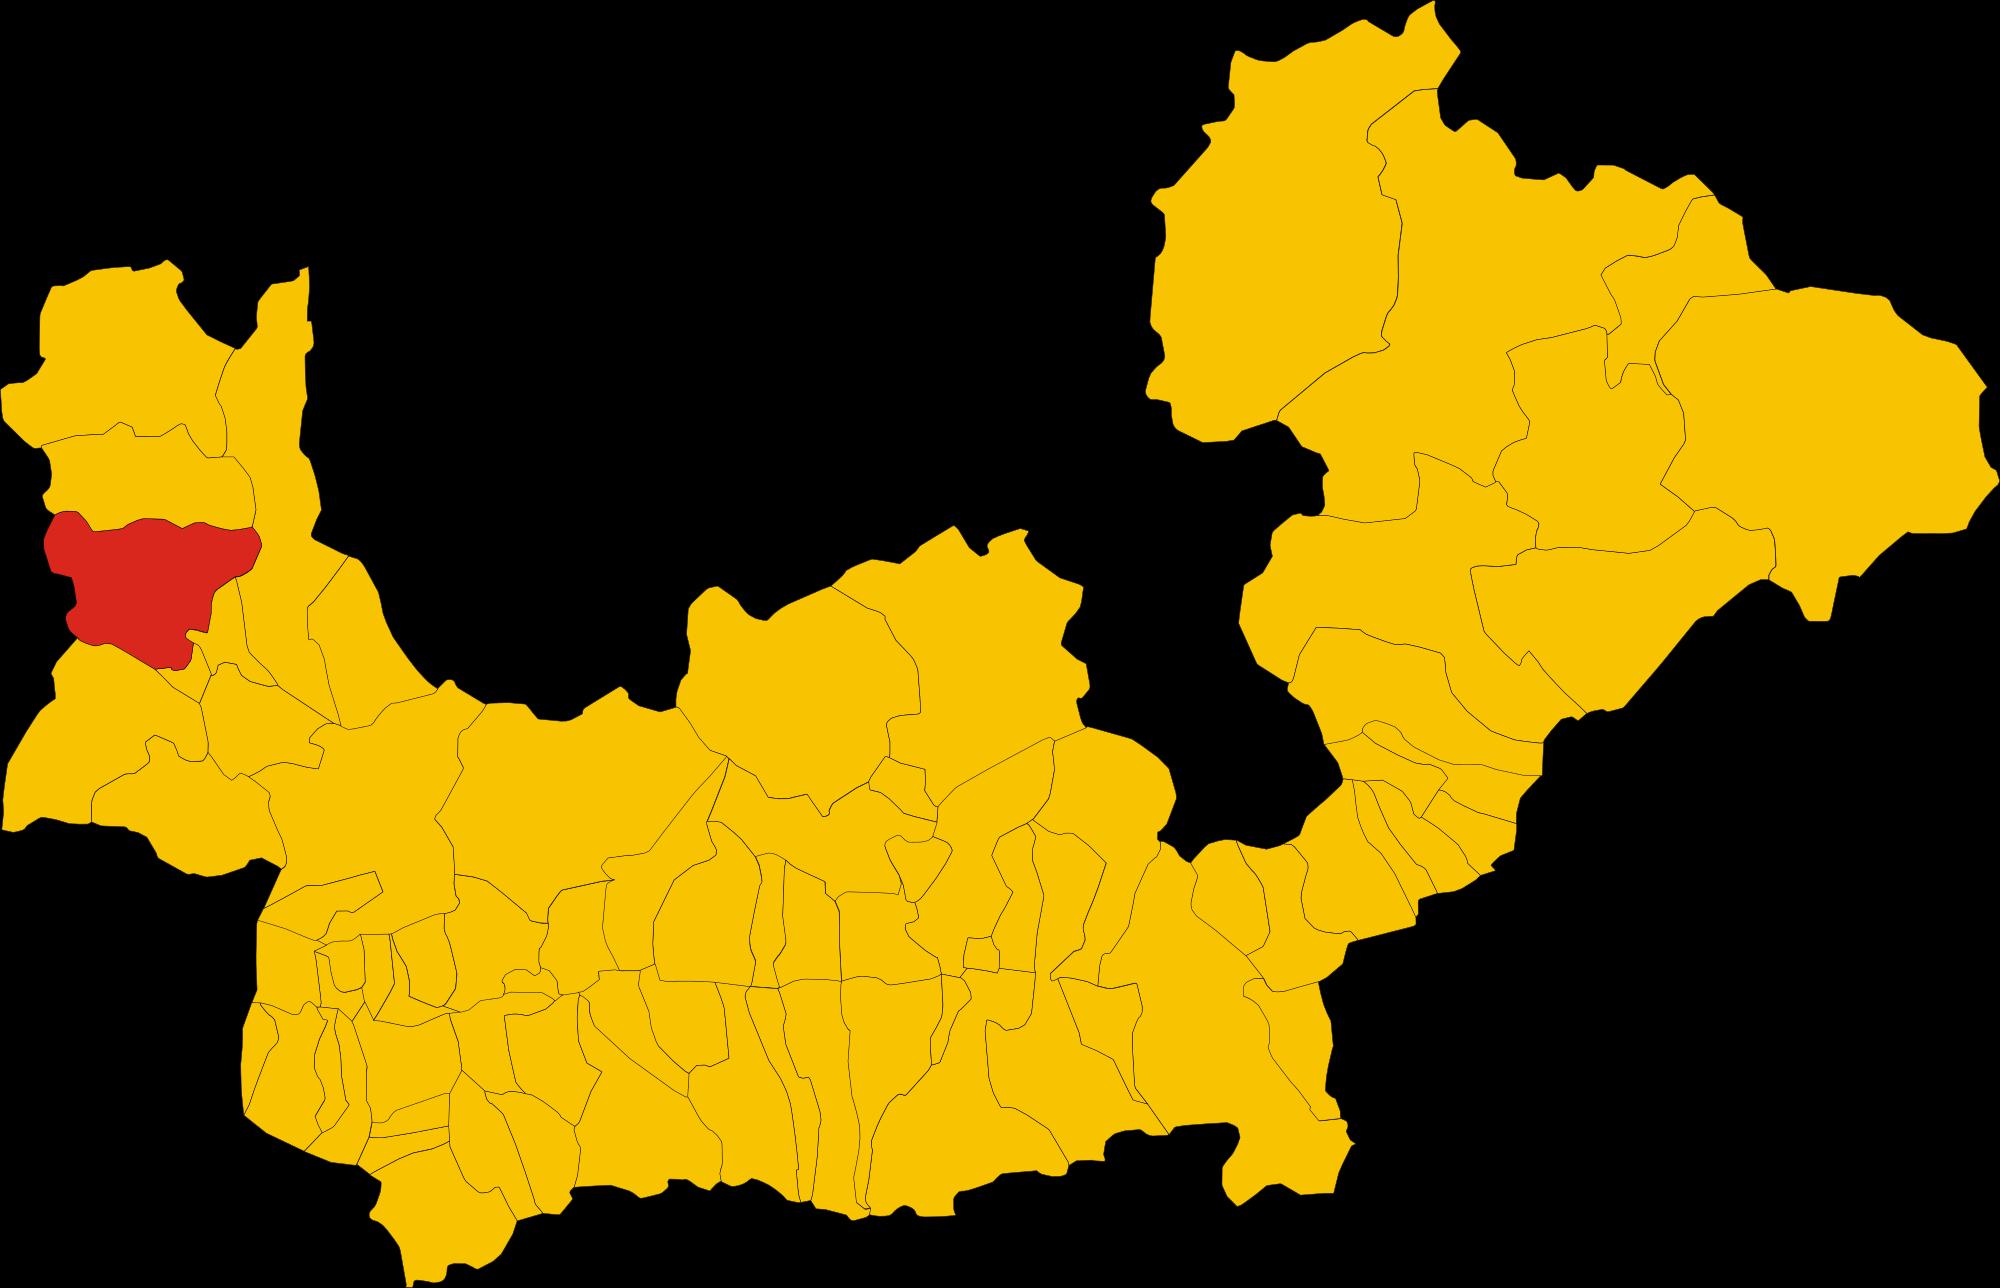 File:Map of comune of San Giacomo Filippo (province of Sondrio.